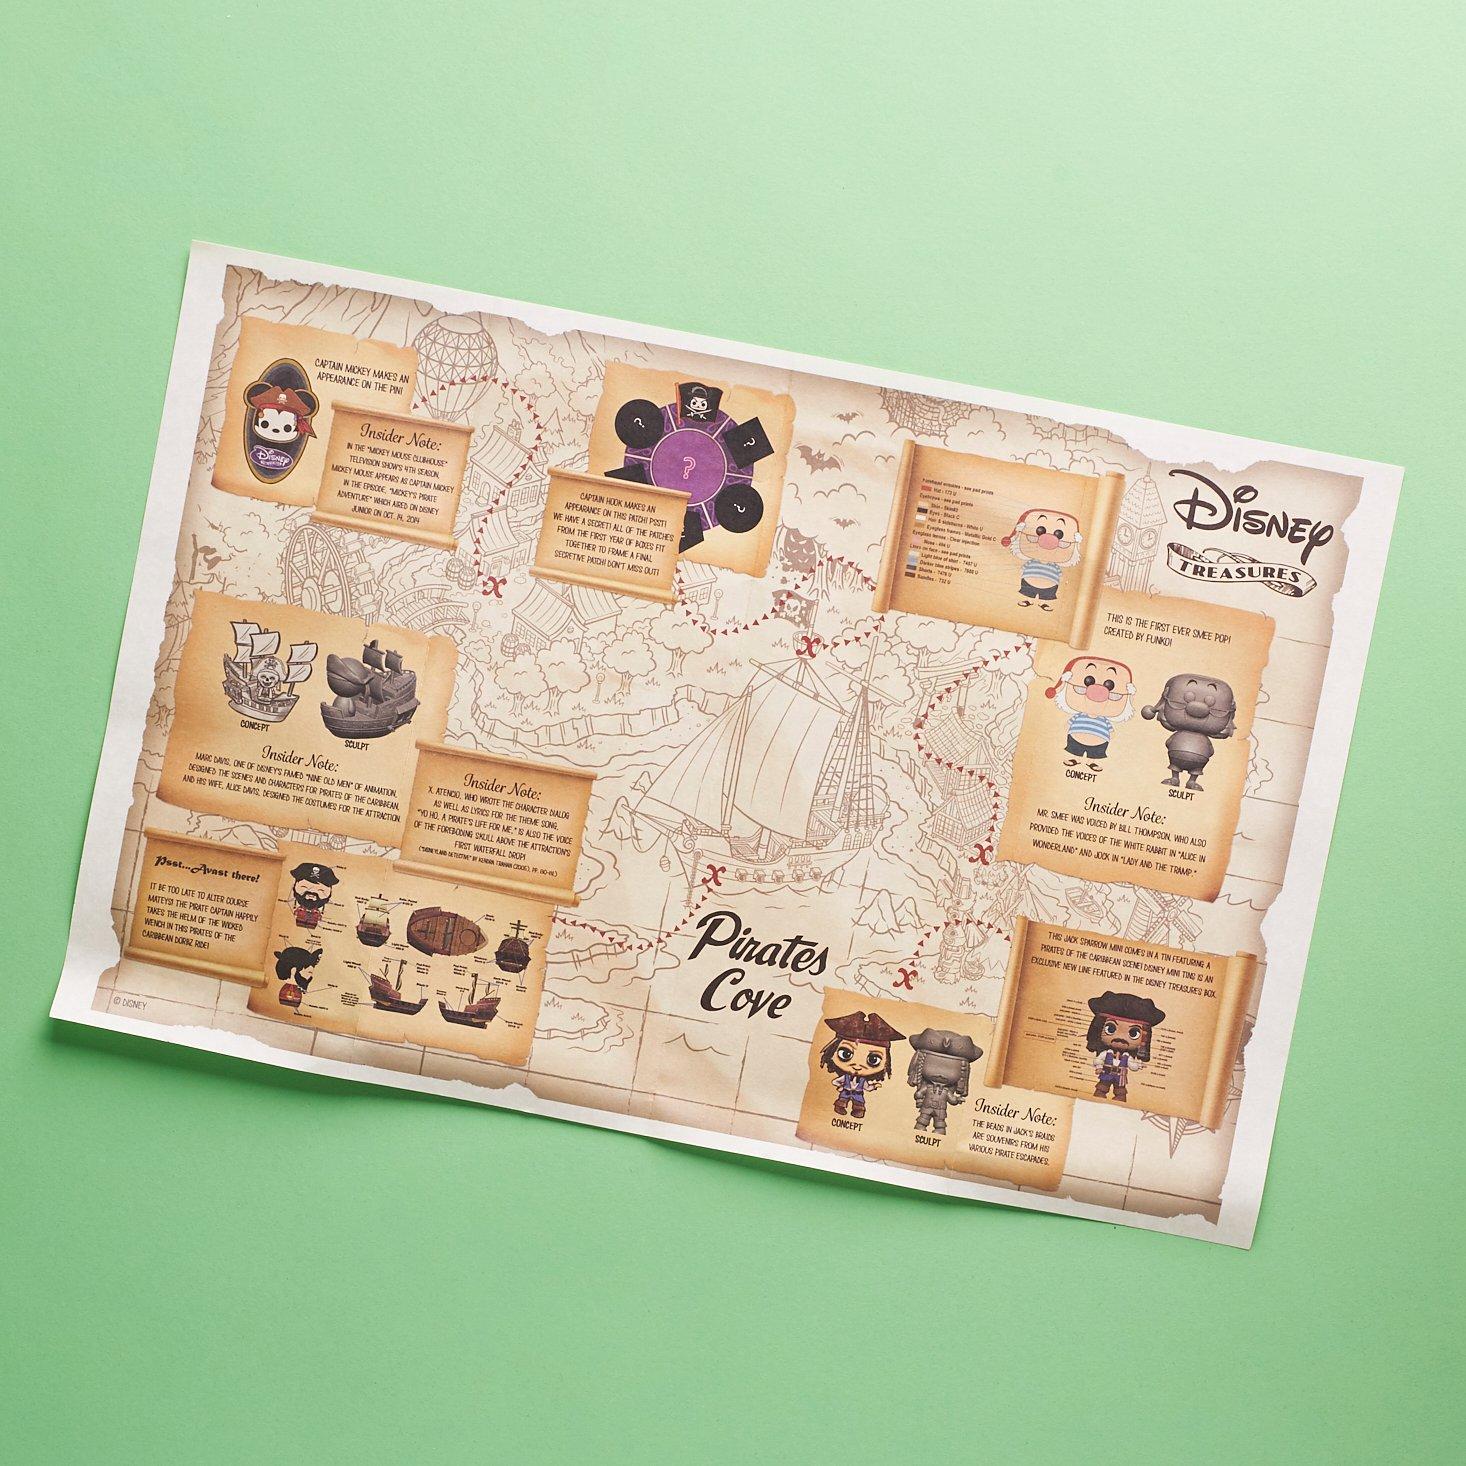 Disney-Treasures-Box-April-2017-0007